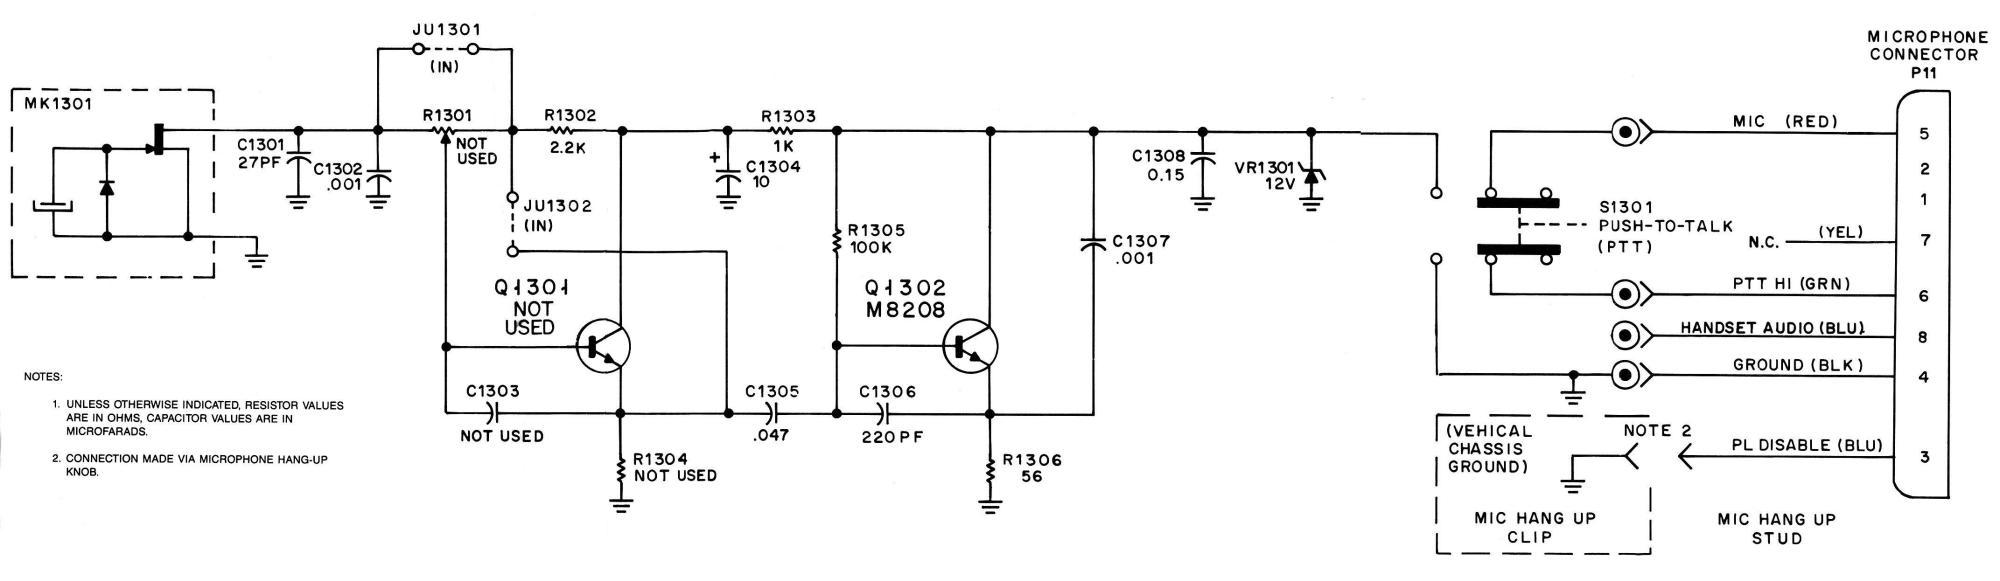 hight resolution of hmn1056d desk mic wire diagram example electrical wiring motorola mic wiring diagram